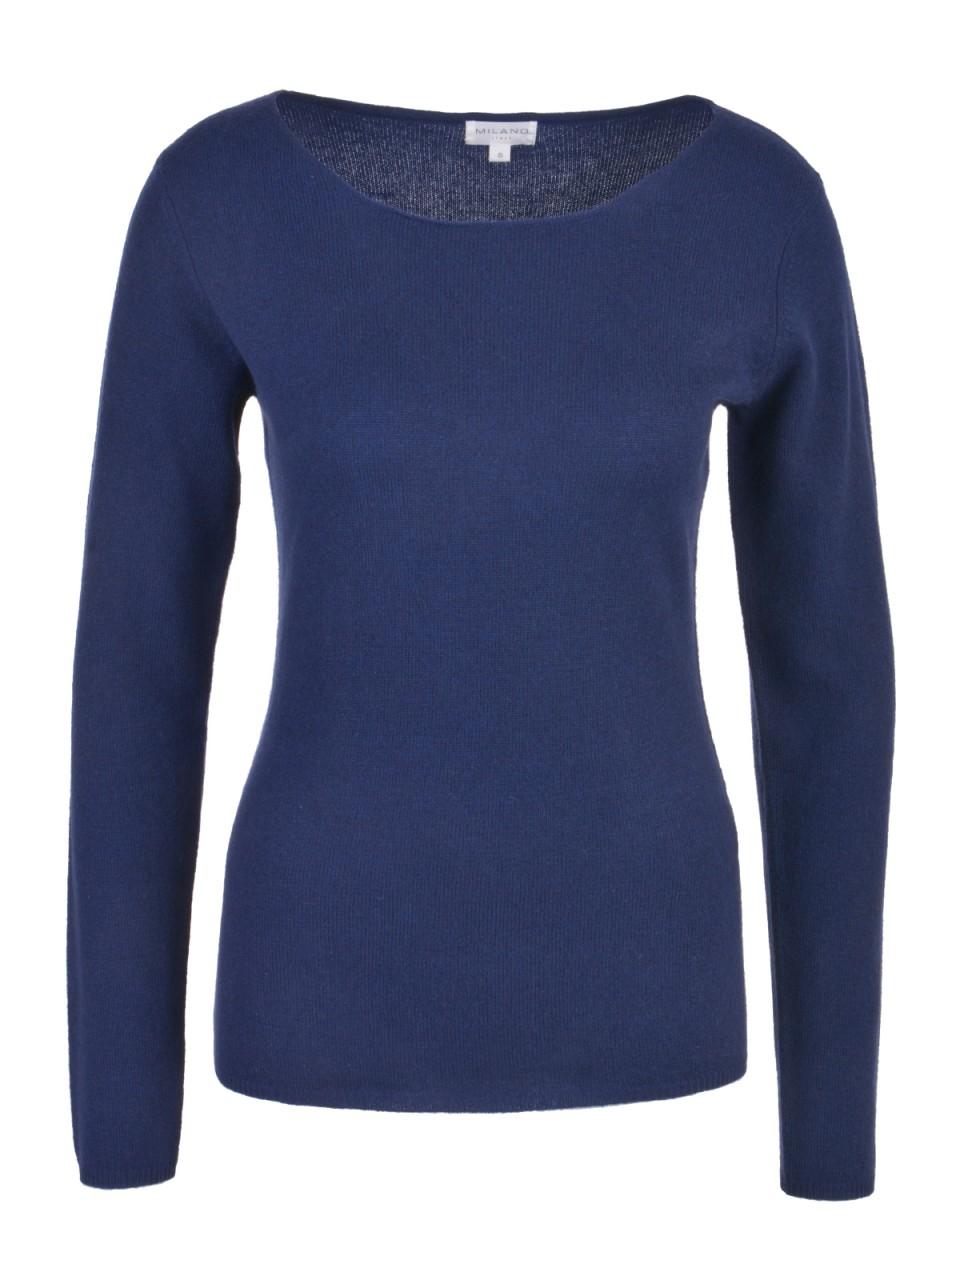 milano-italy-damen-kaschmir-pullover-dunkelblau